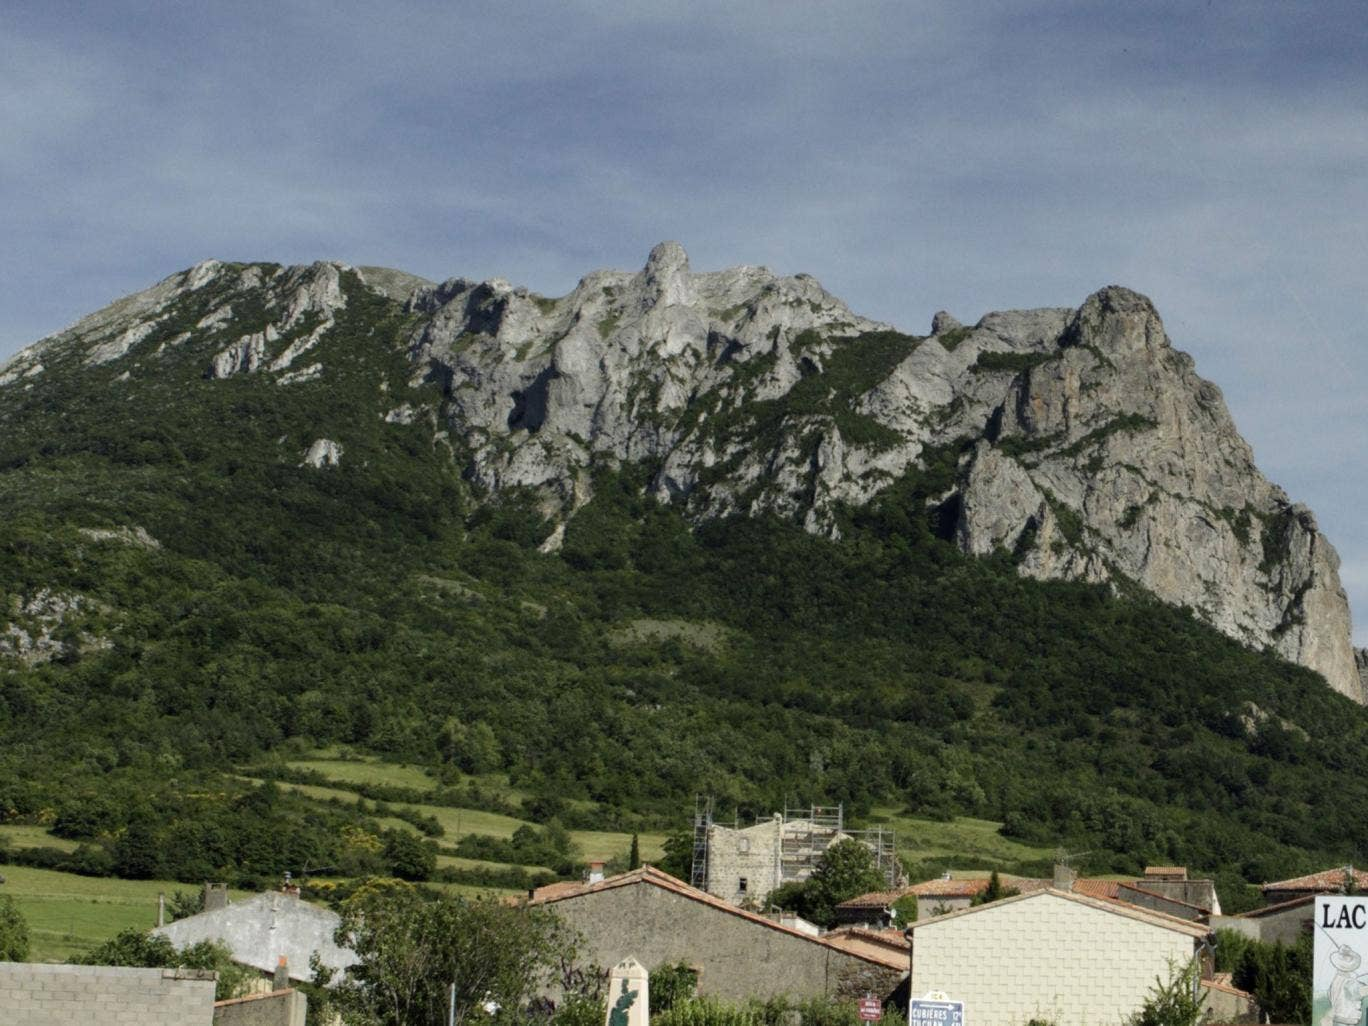 Pic de Bugarach mountain in France